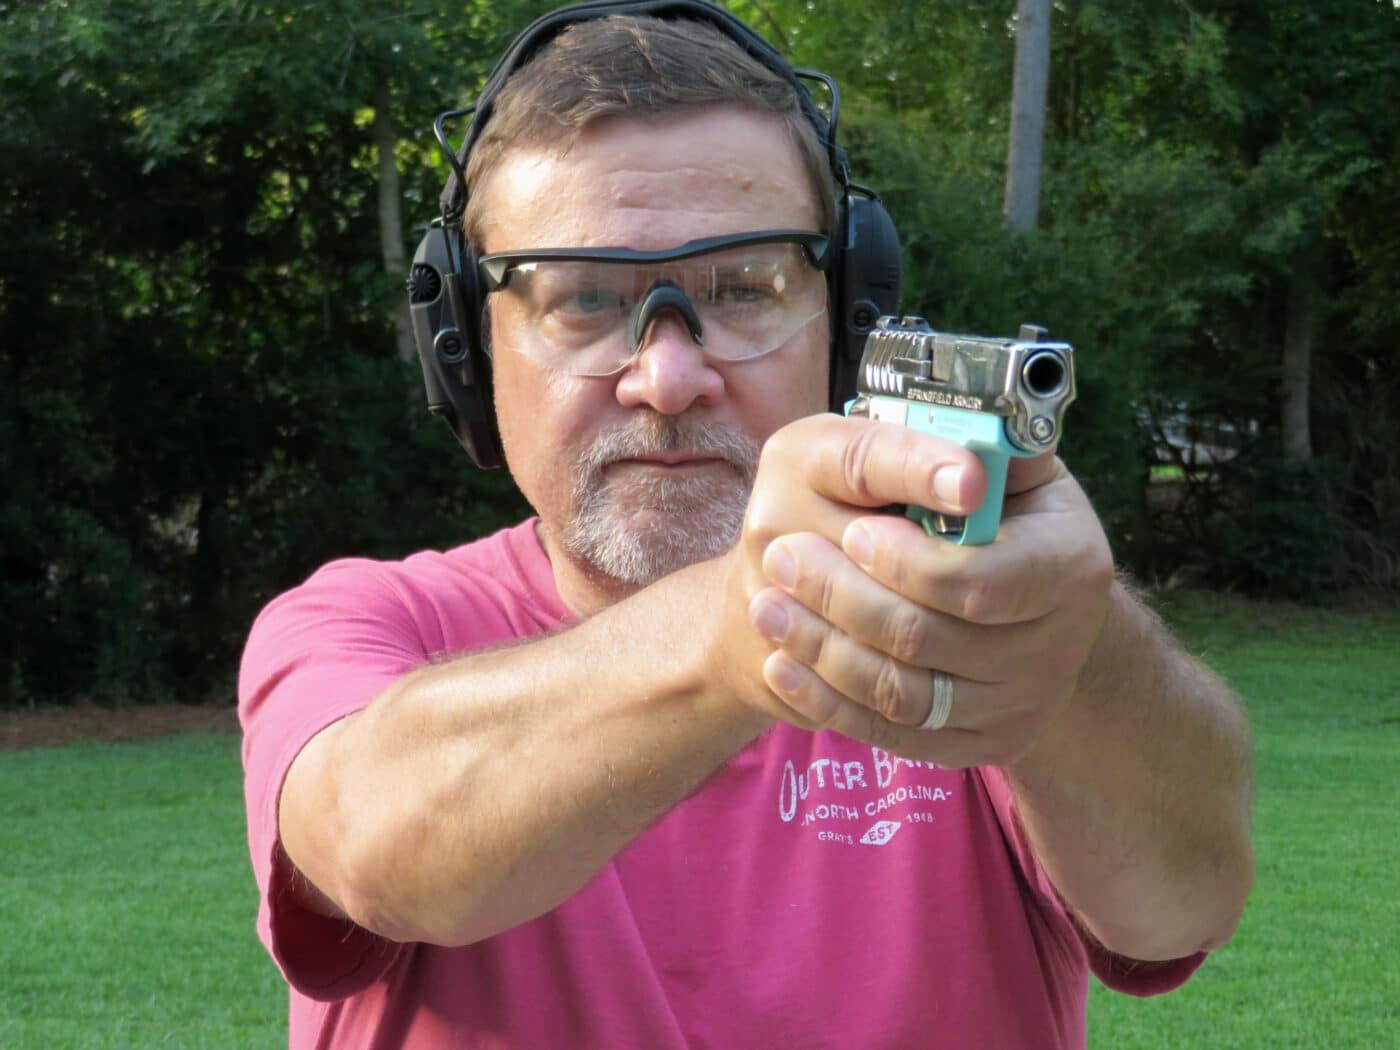 Man shooting a Vintage Blue 911 pistol